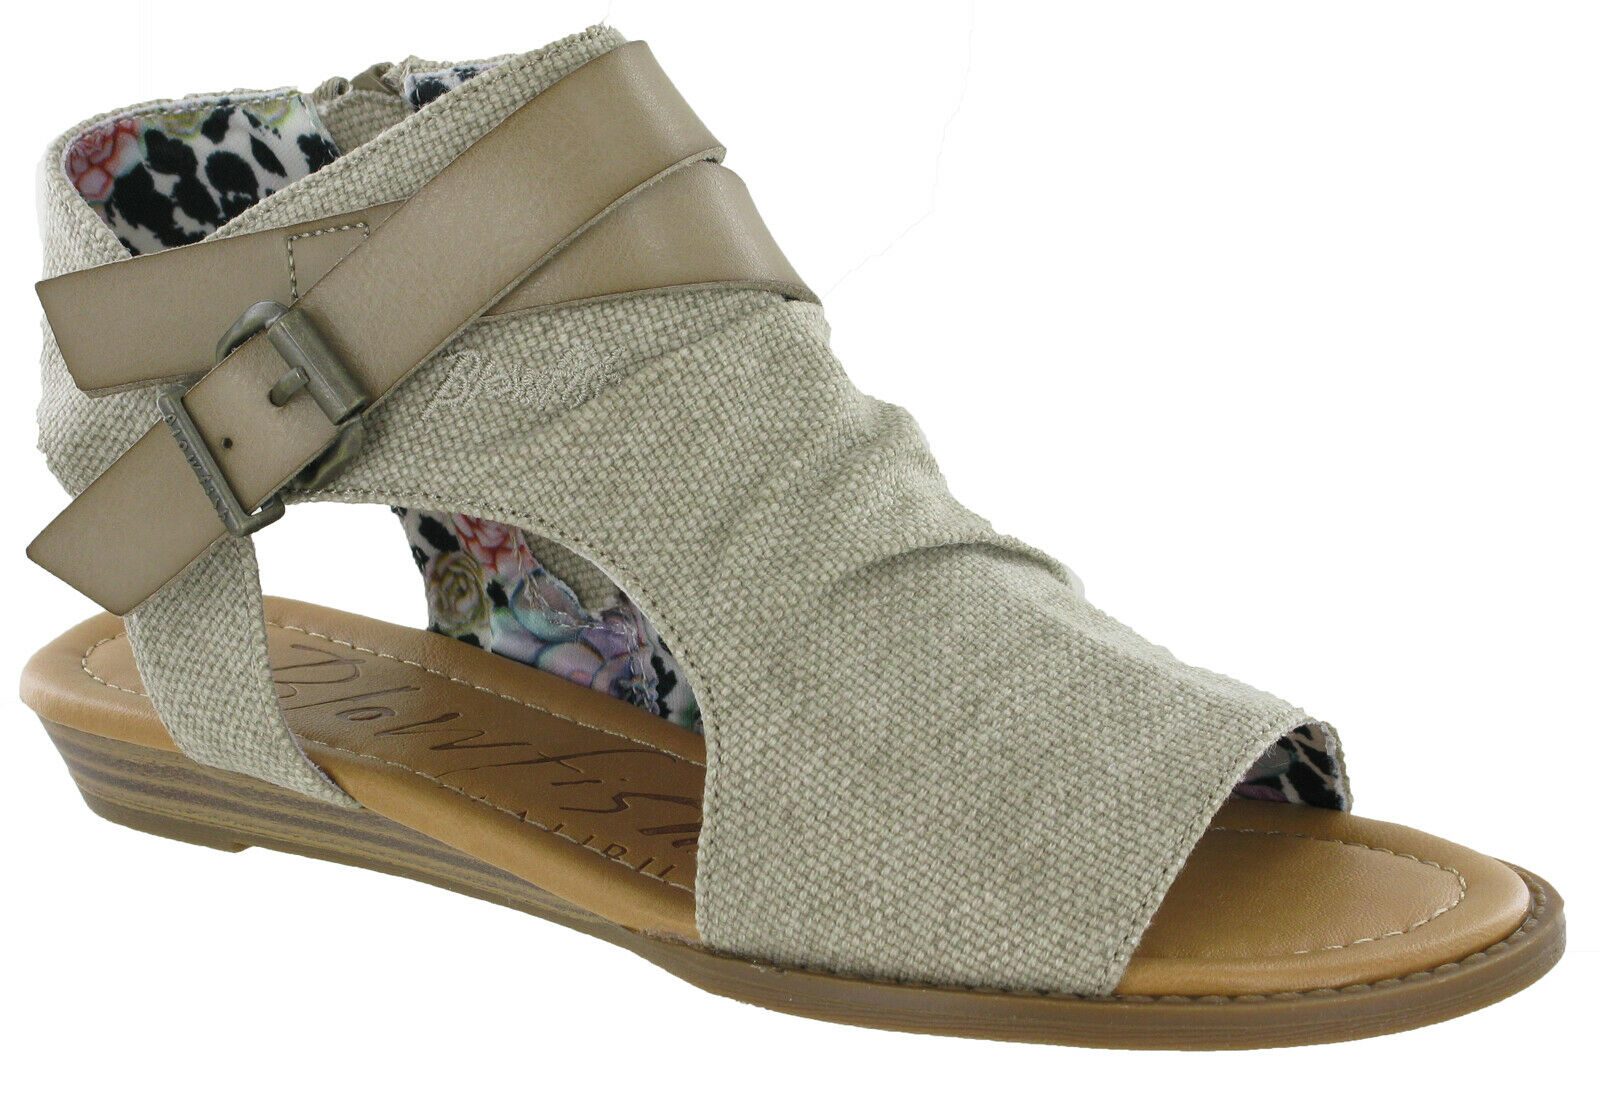 Blowfish Balla Flats Womens Open Toe Fashion Sandals Casual Zip Up Ladies Shoes